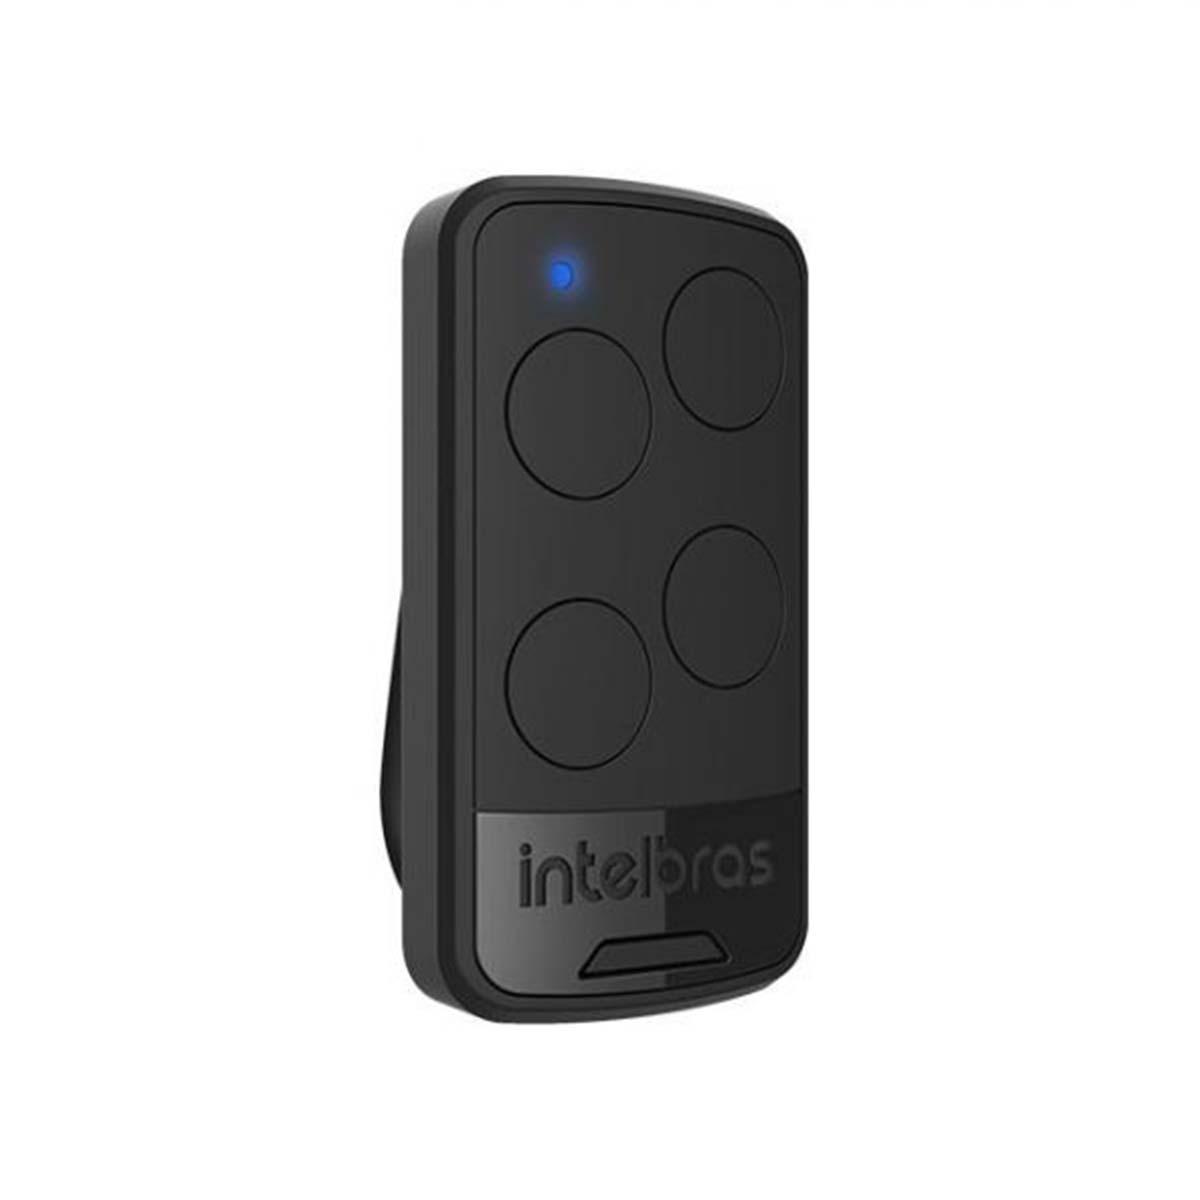 Kit 10 Controle Remoto Ep 04 Intelbras